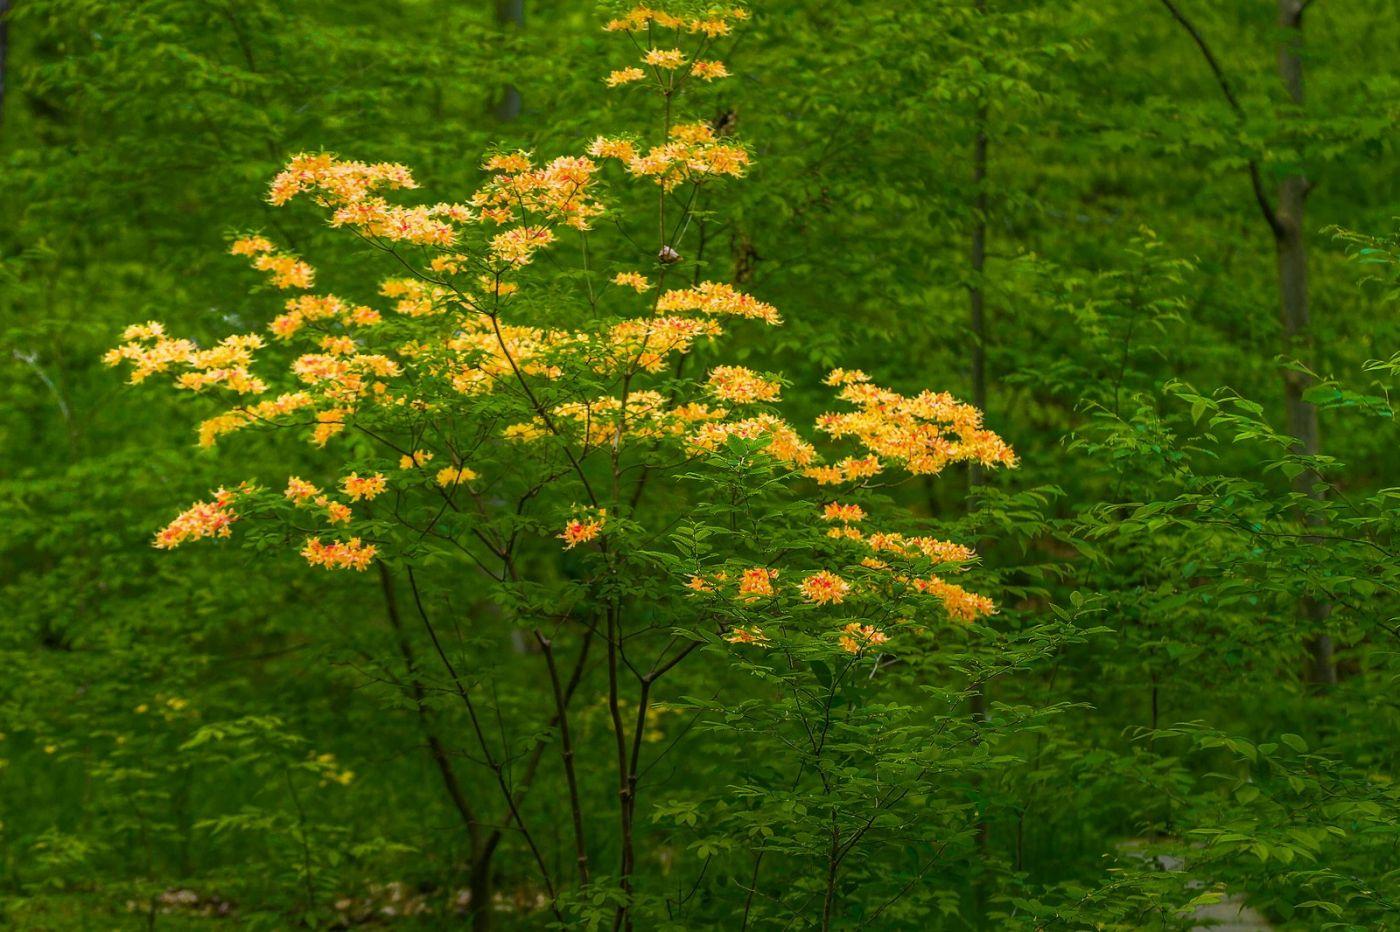 Chanticleer花园,有梦想的季节_图1-29